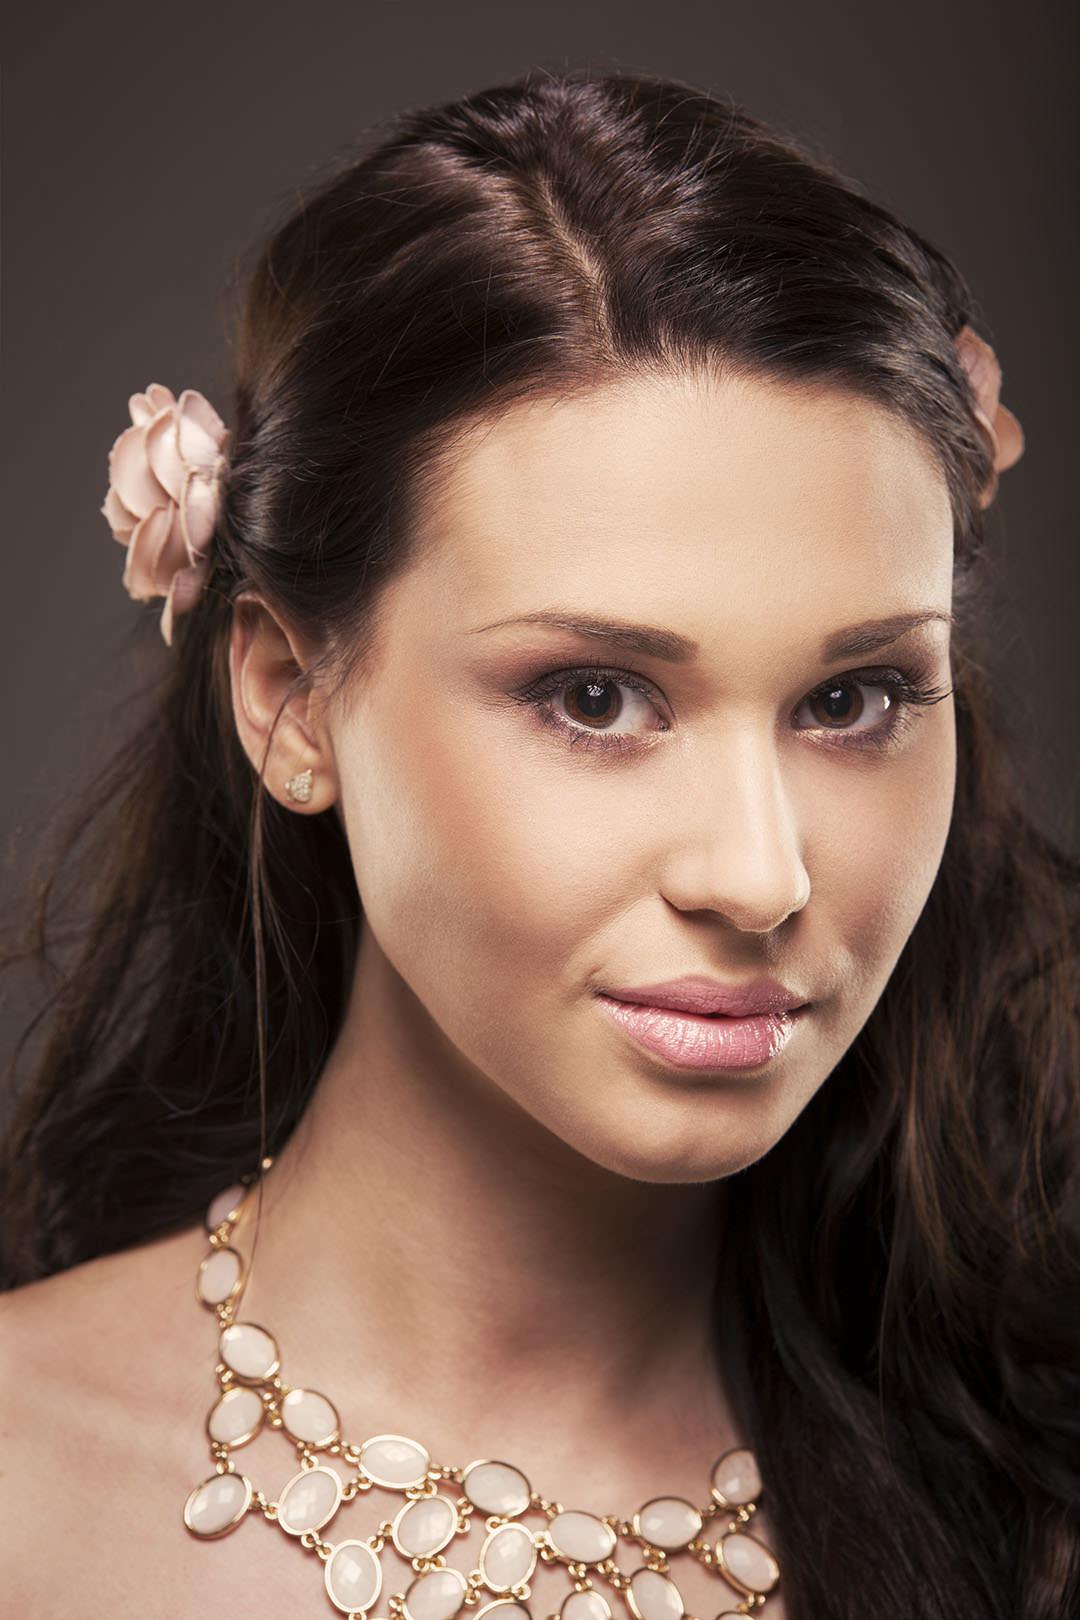 Magdalena_Dziadkowiak-Stefaniak_make_up_09